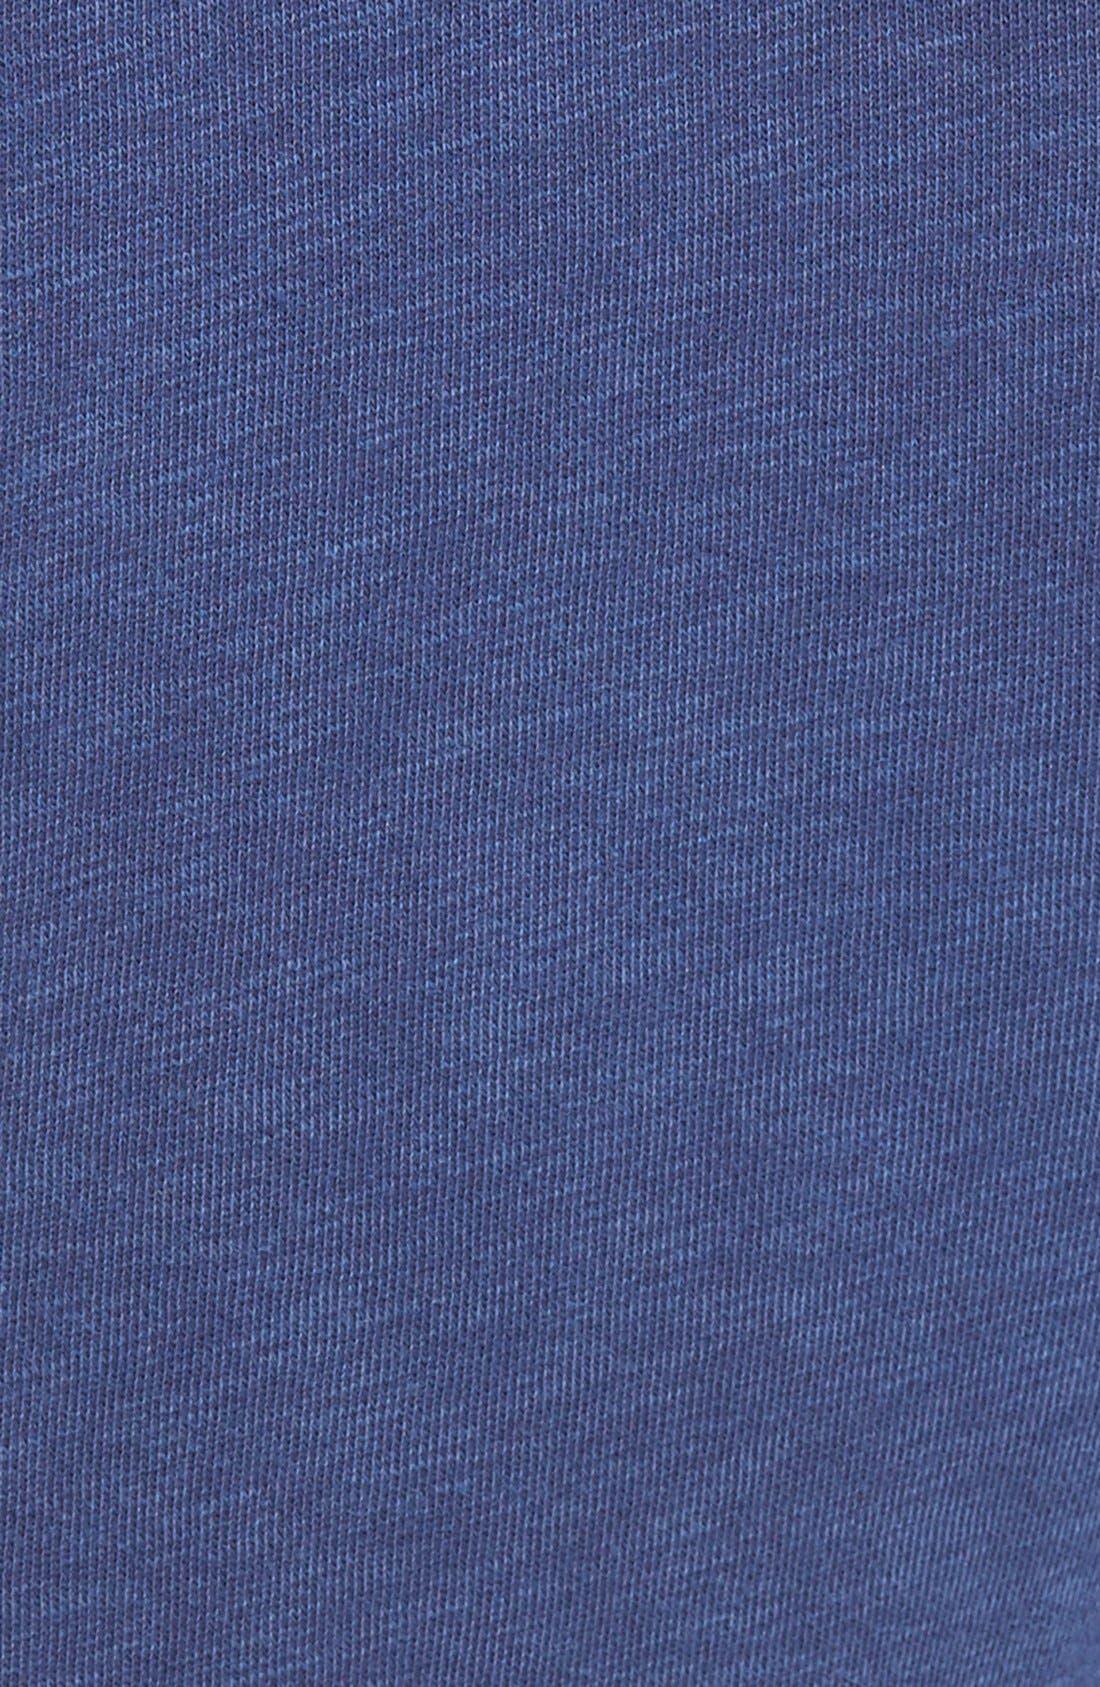 'Classic' Sweatpants,                             Alternate thumbnail 41, color,